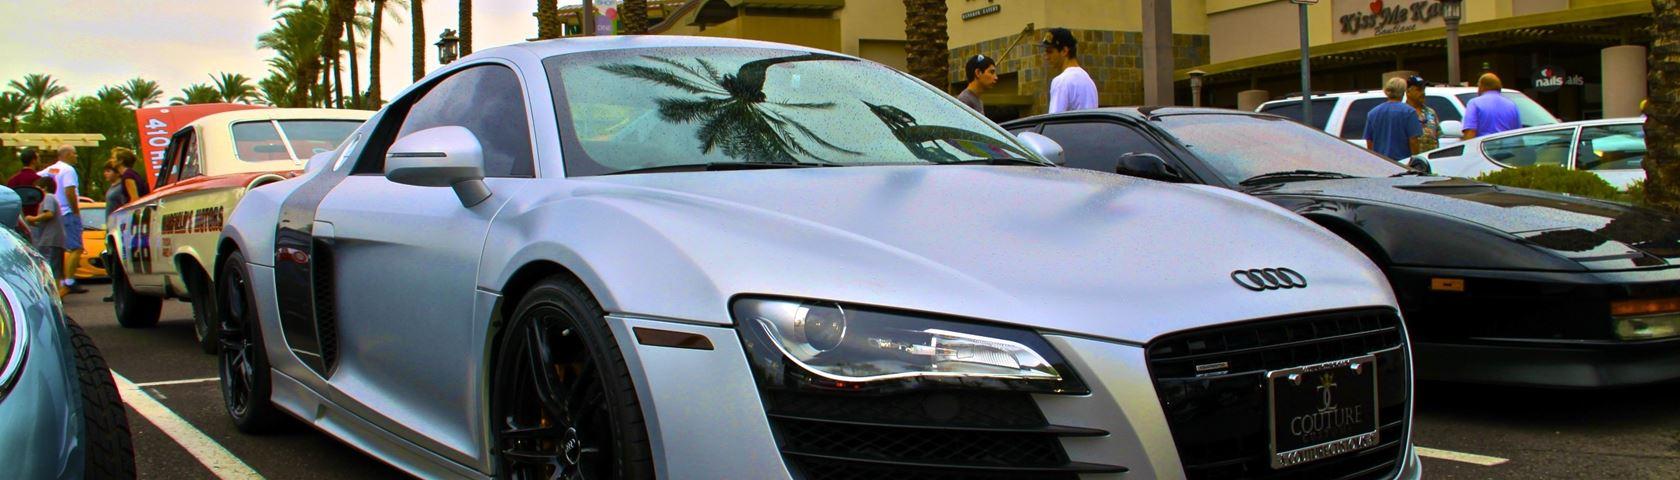 Matte Gun Metal Grey Audi R8 V10